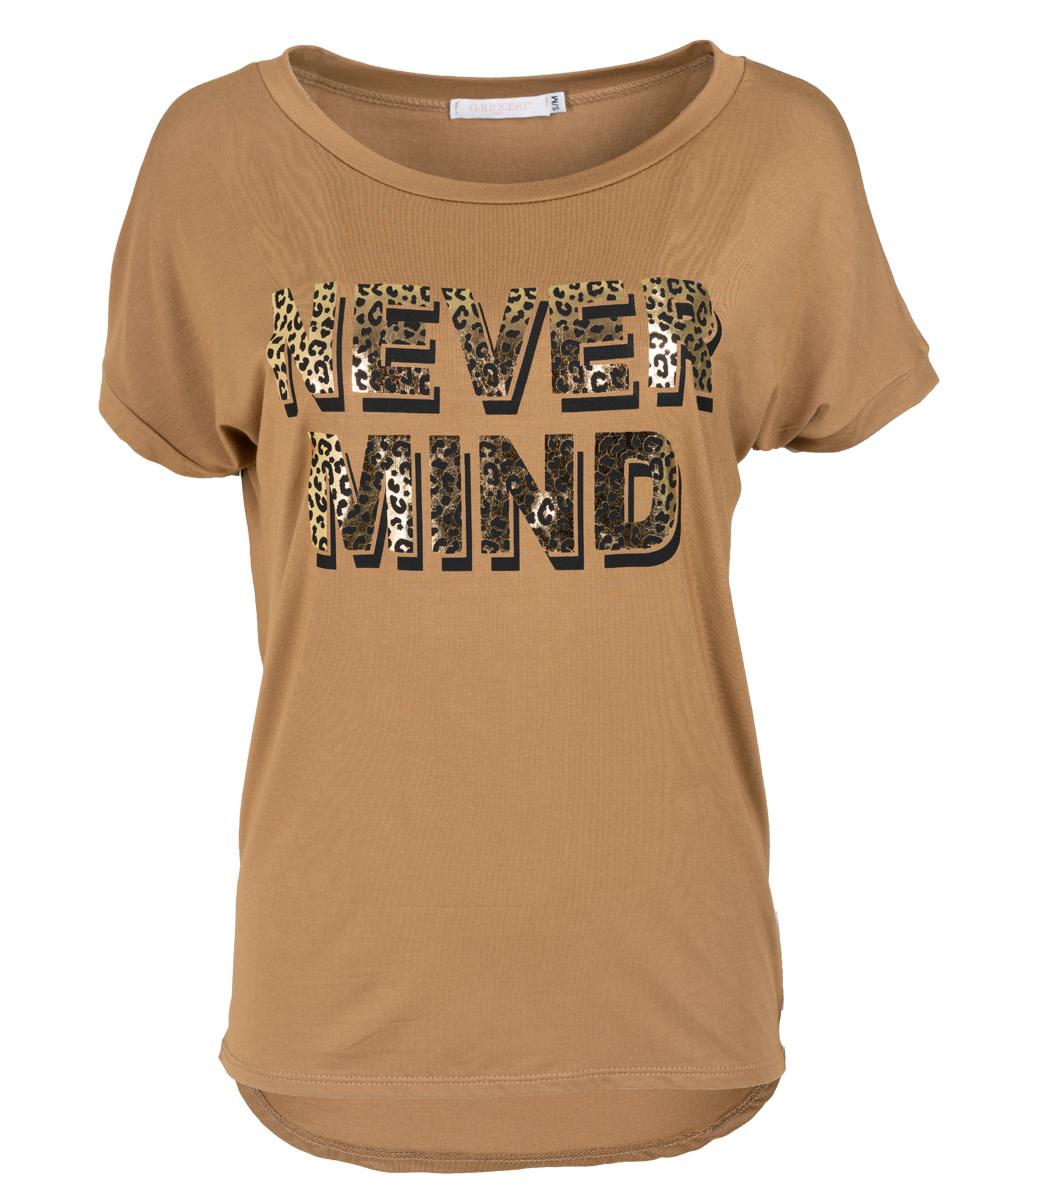 Gemma Ricceri Shirt Camel never mind